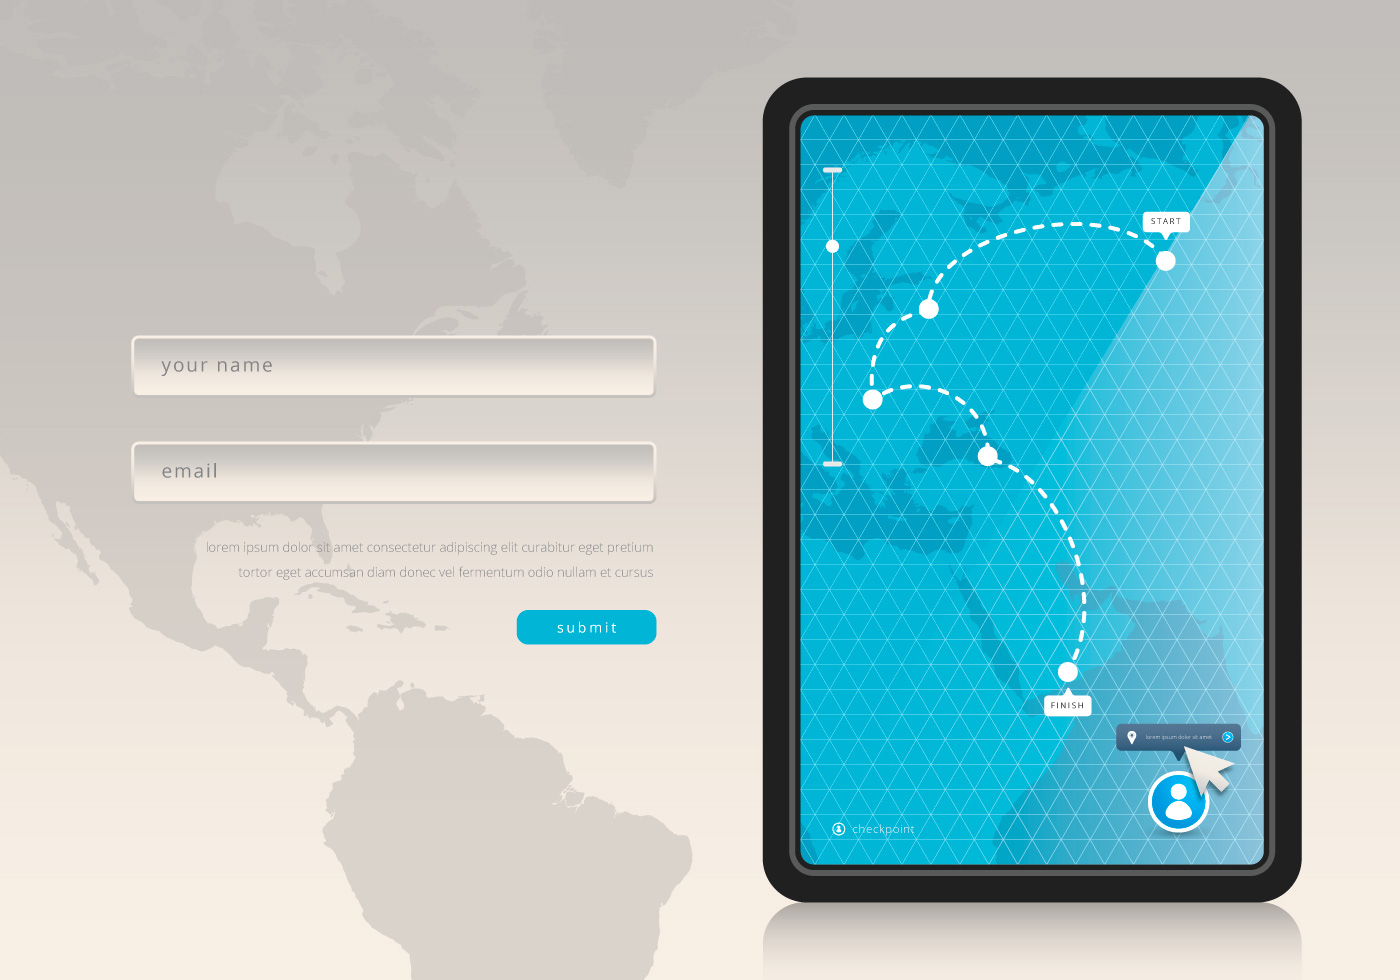 Puntero De Ubicación: Mouse Sobre Ubicación / Programa De GPS. Menú De Diseño